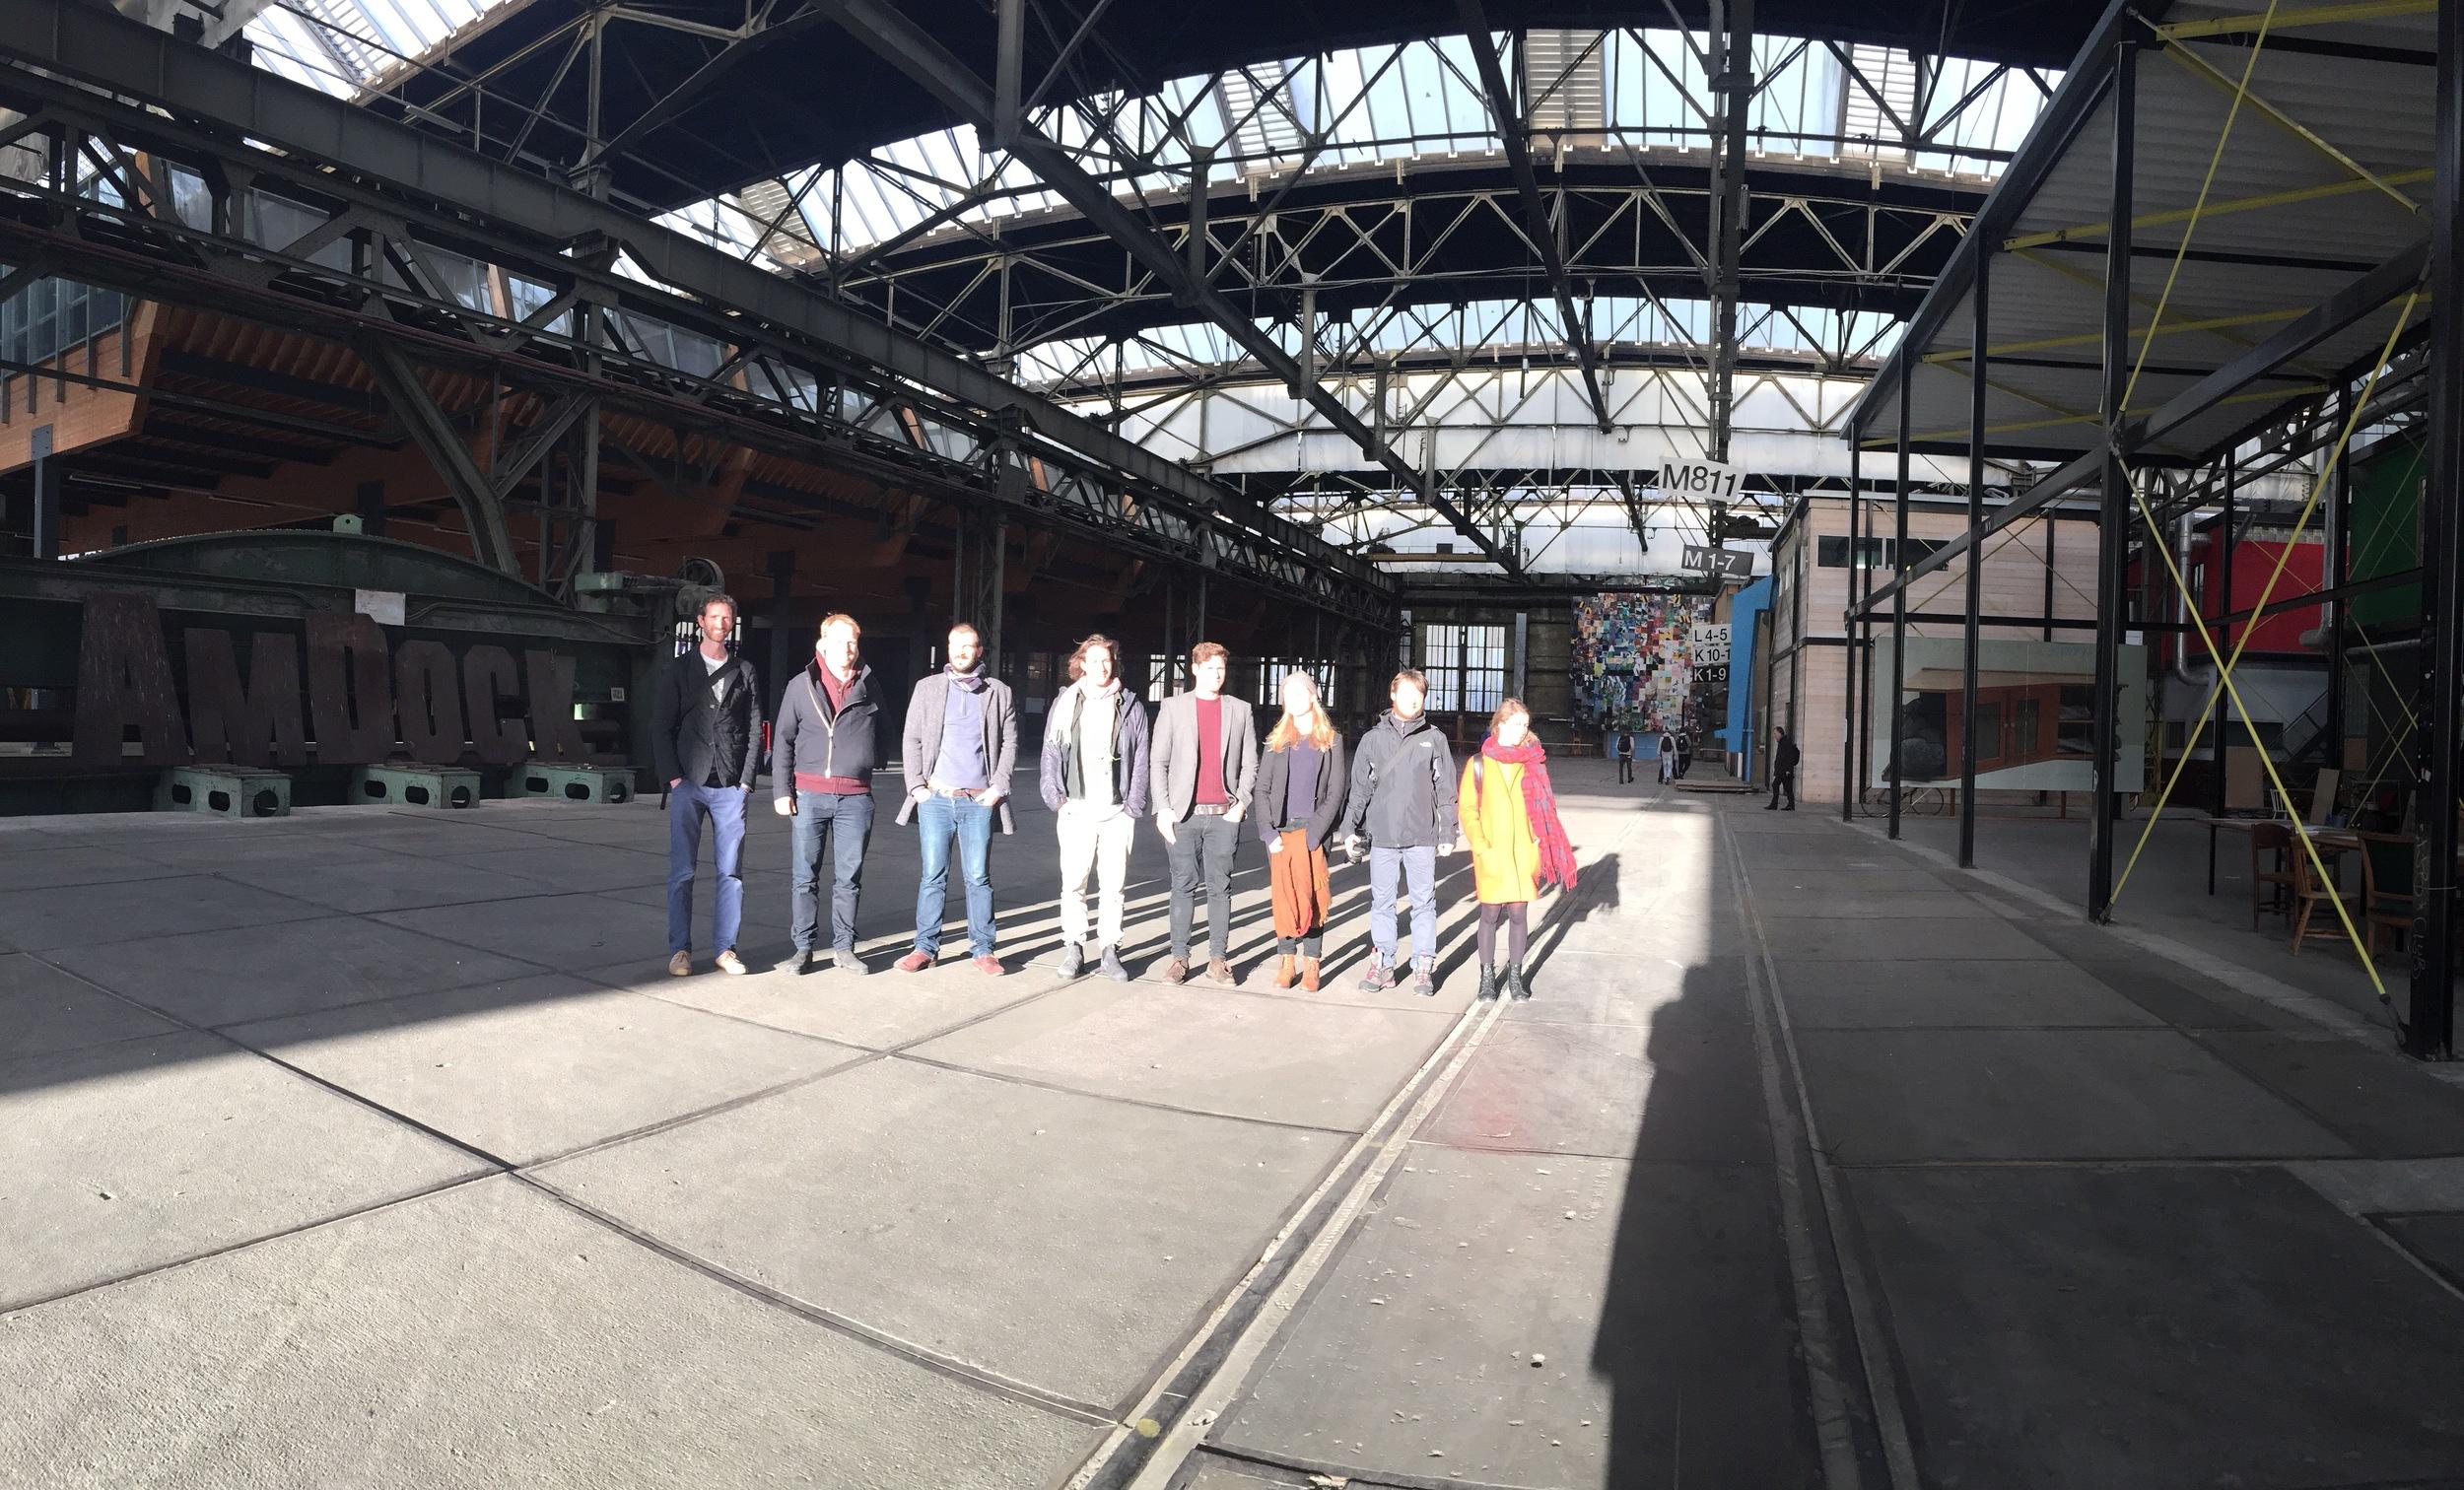 A + A team at NDSM, a former shipyard turned into a creative hub.